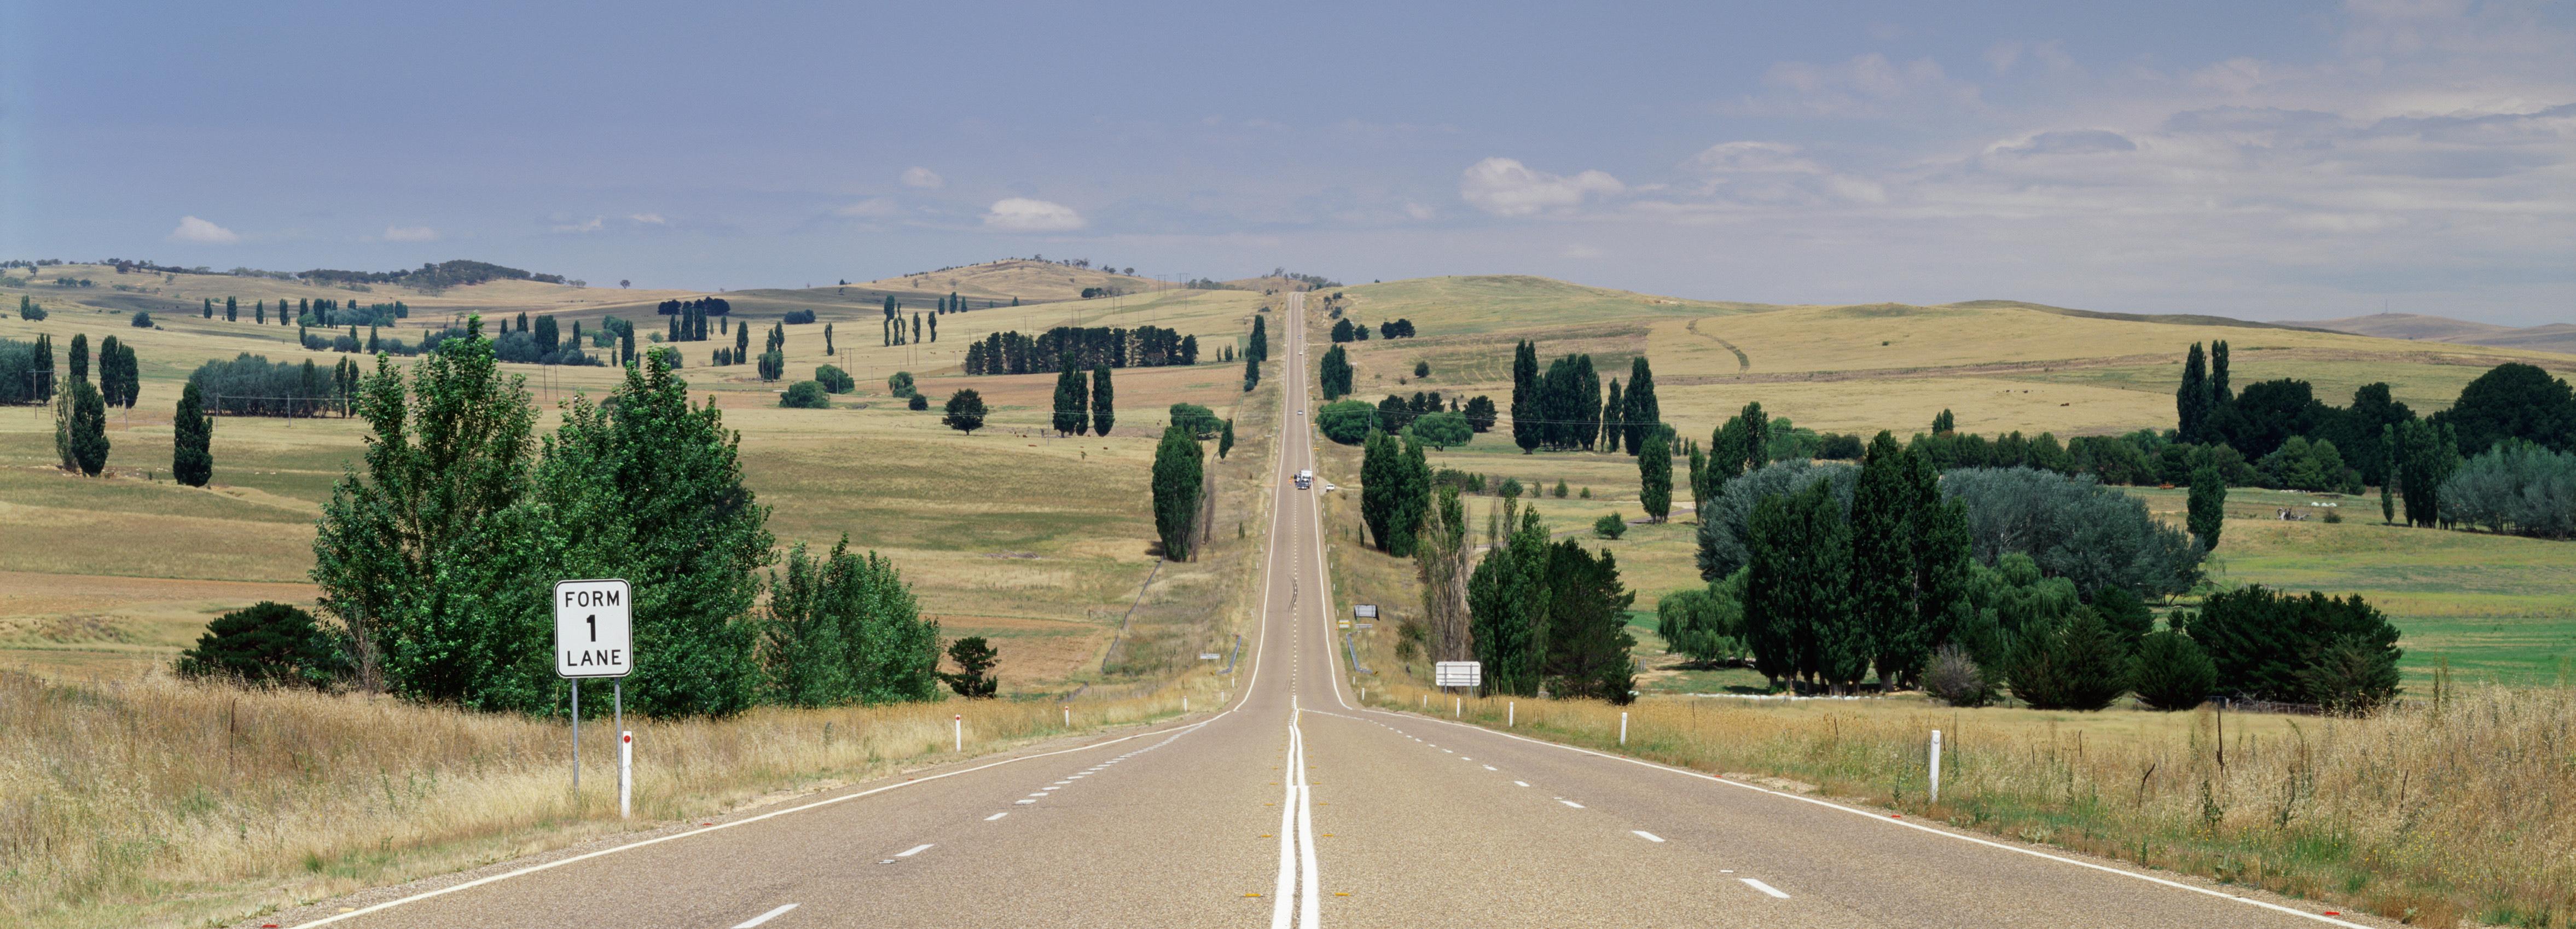 Melton highway